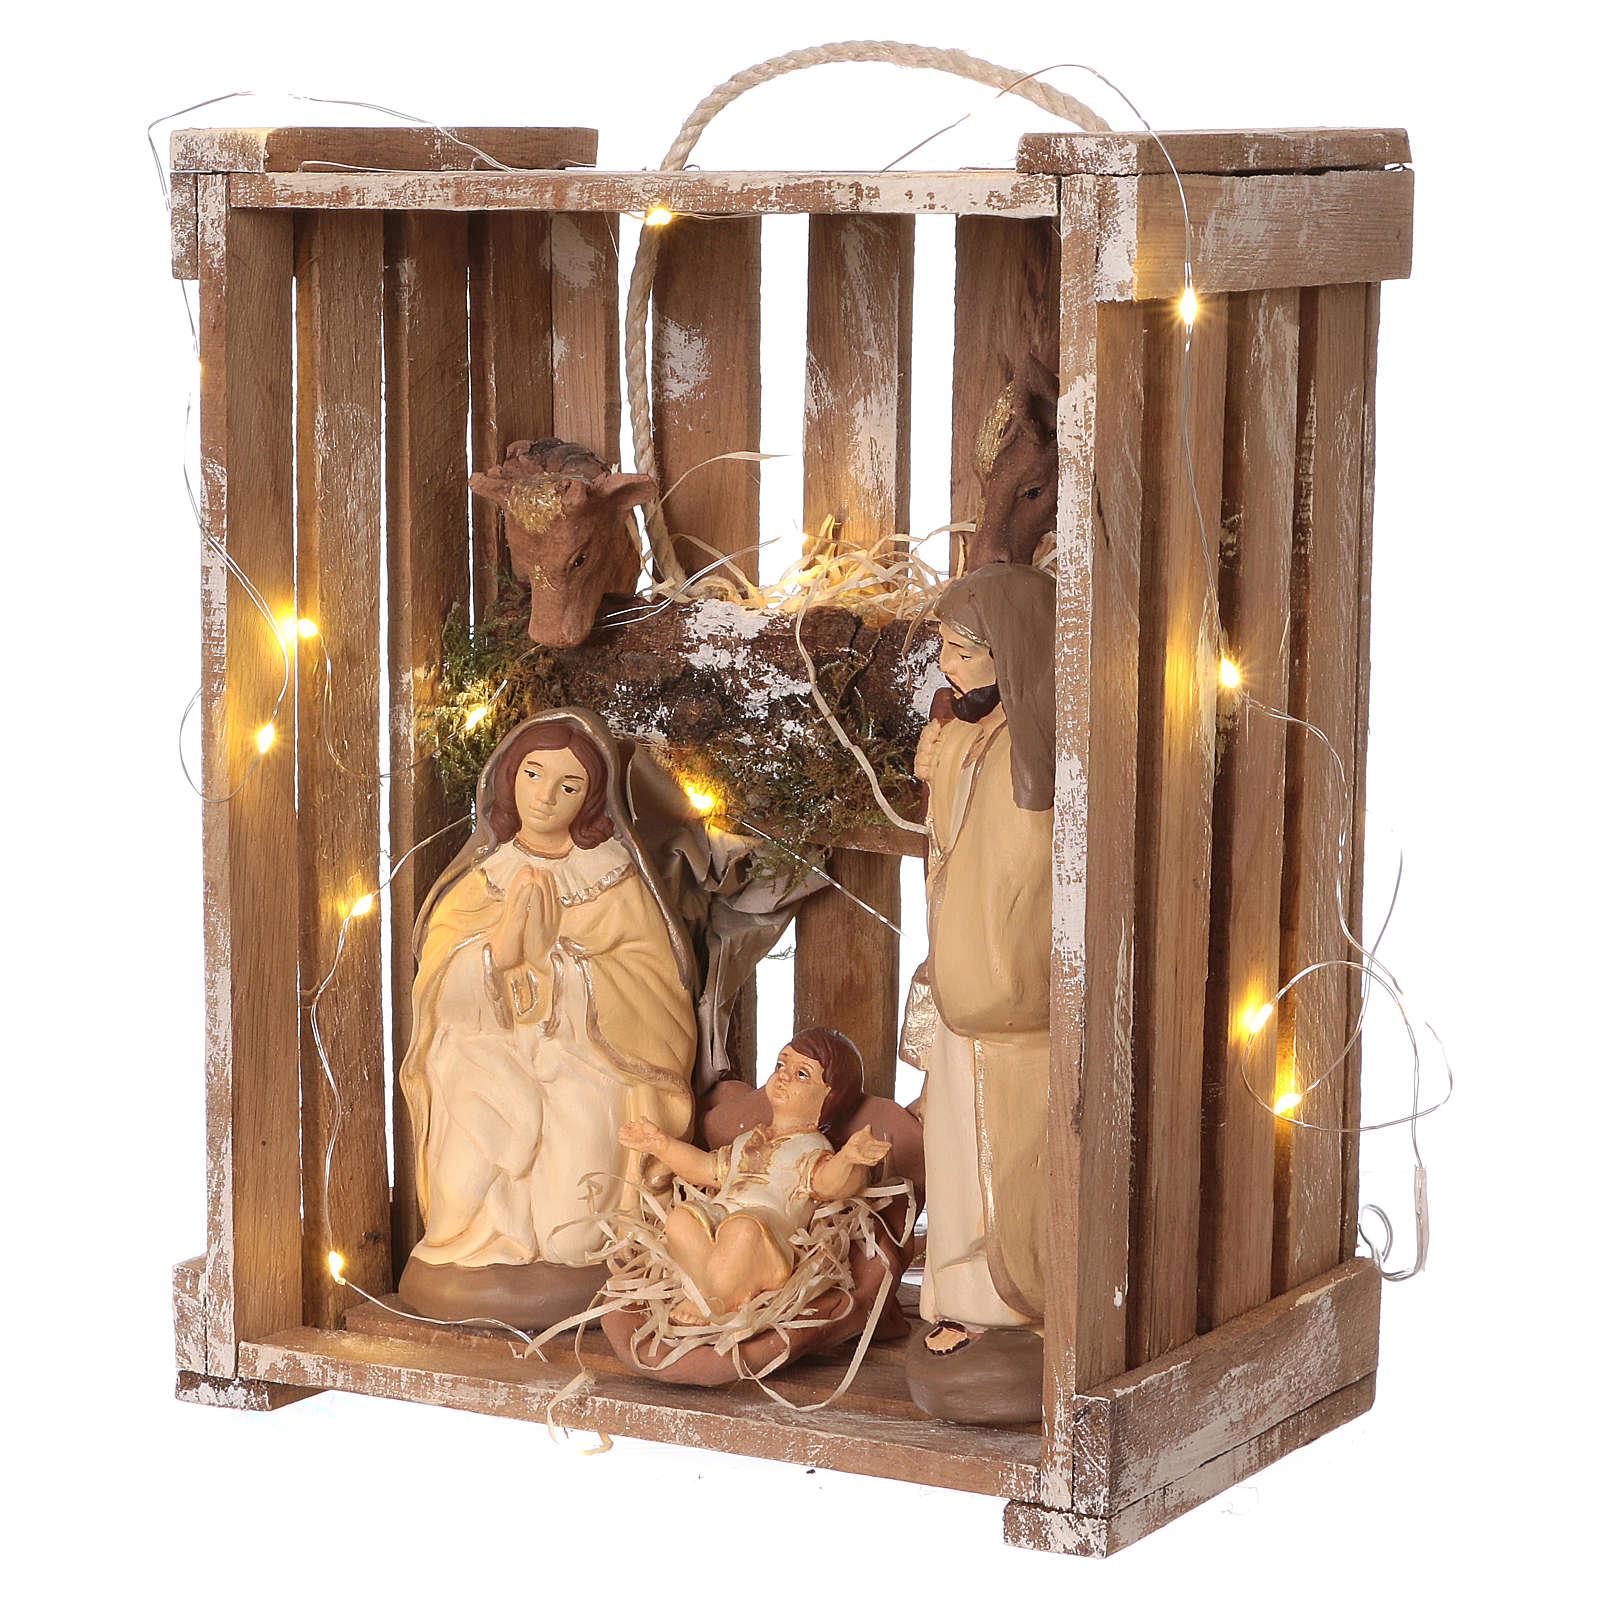 Cajita luces portátil madera musgo con Natividad belén 20 cm Deruta 4